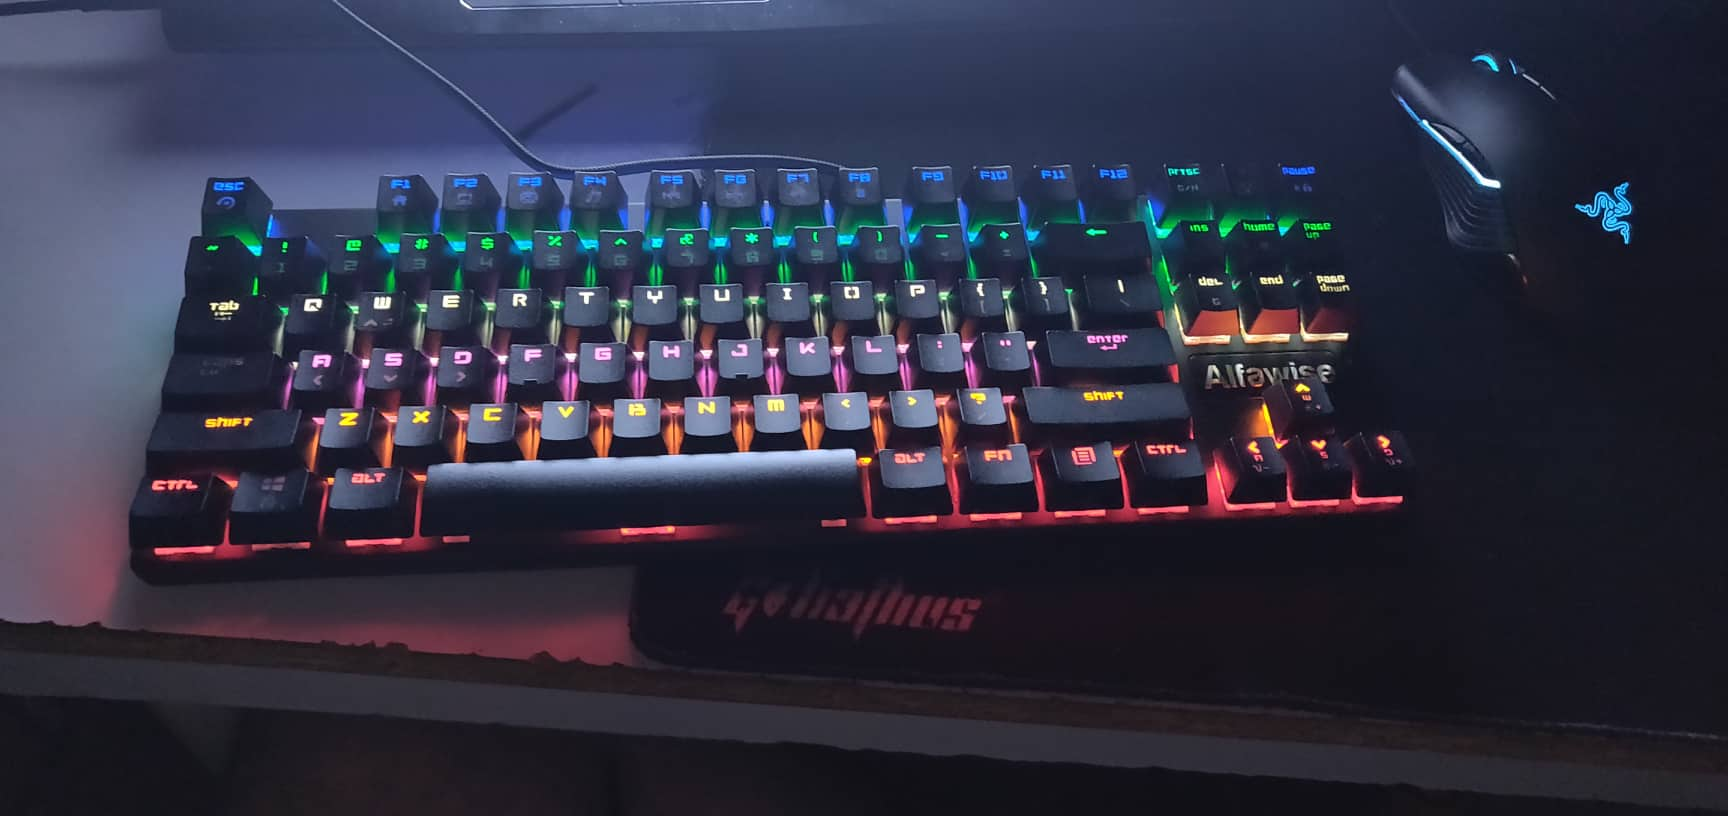 Alfawise K1 Mechanical Gaming Keyboard backlit